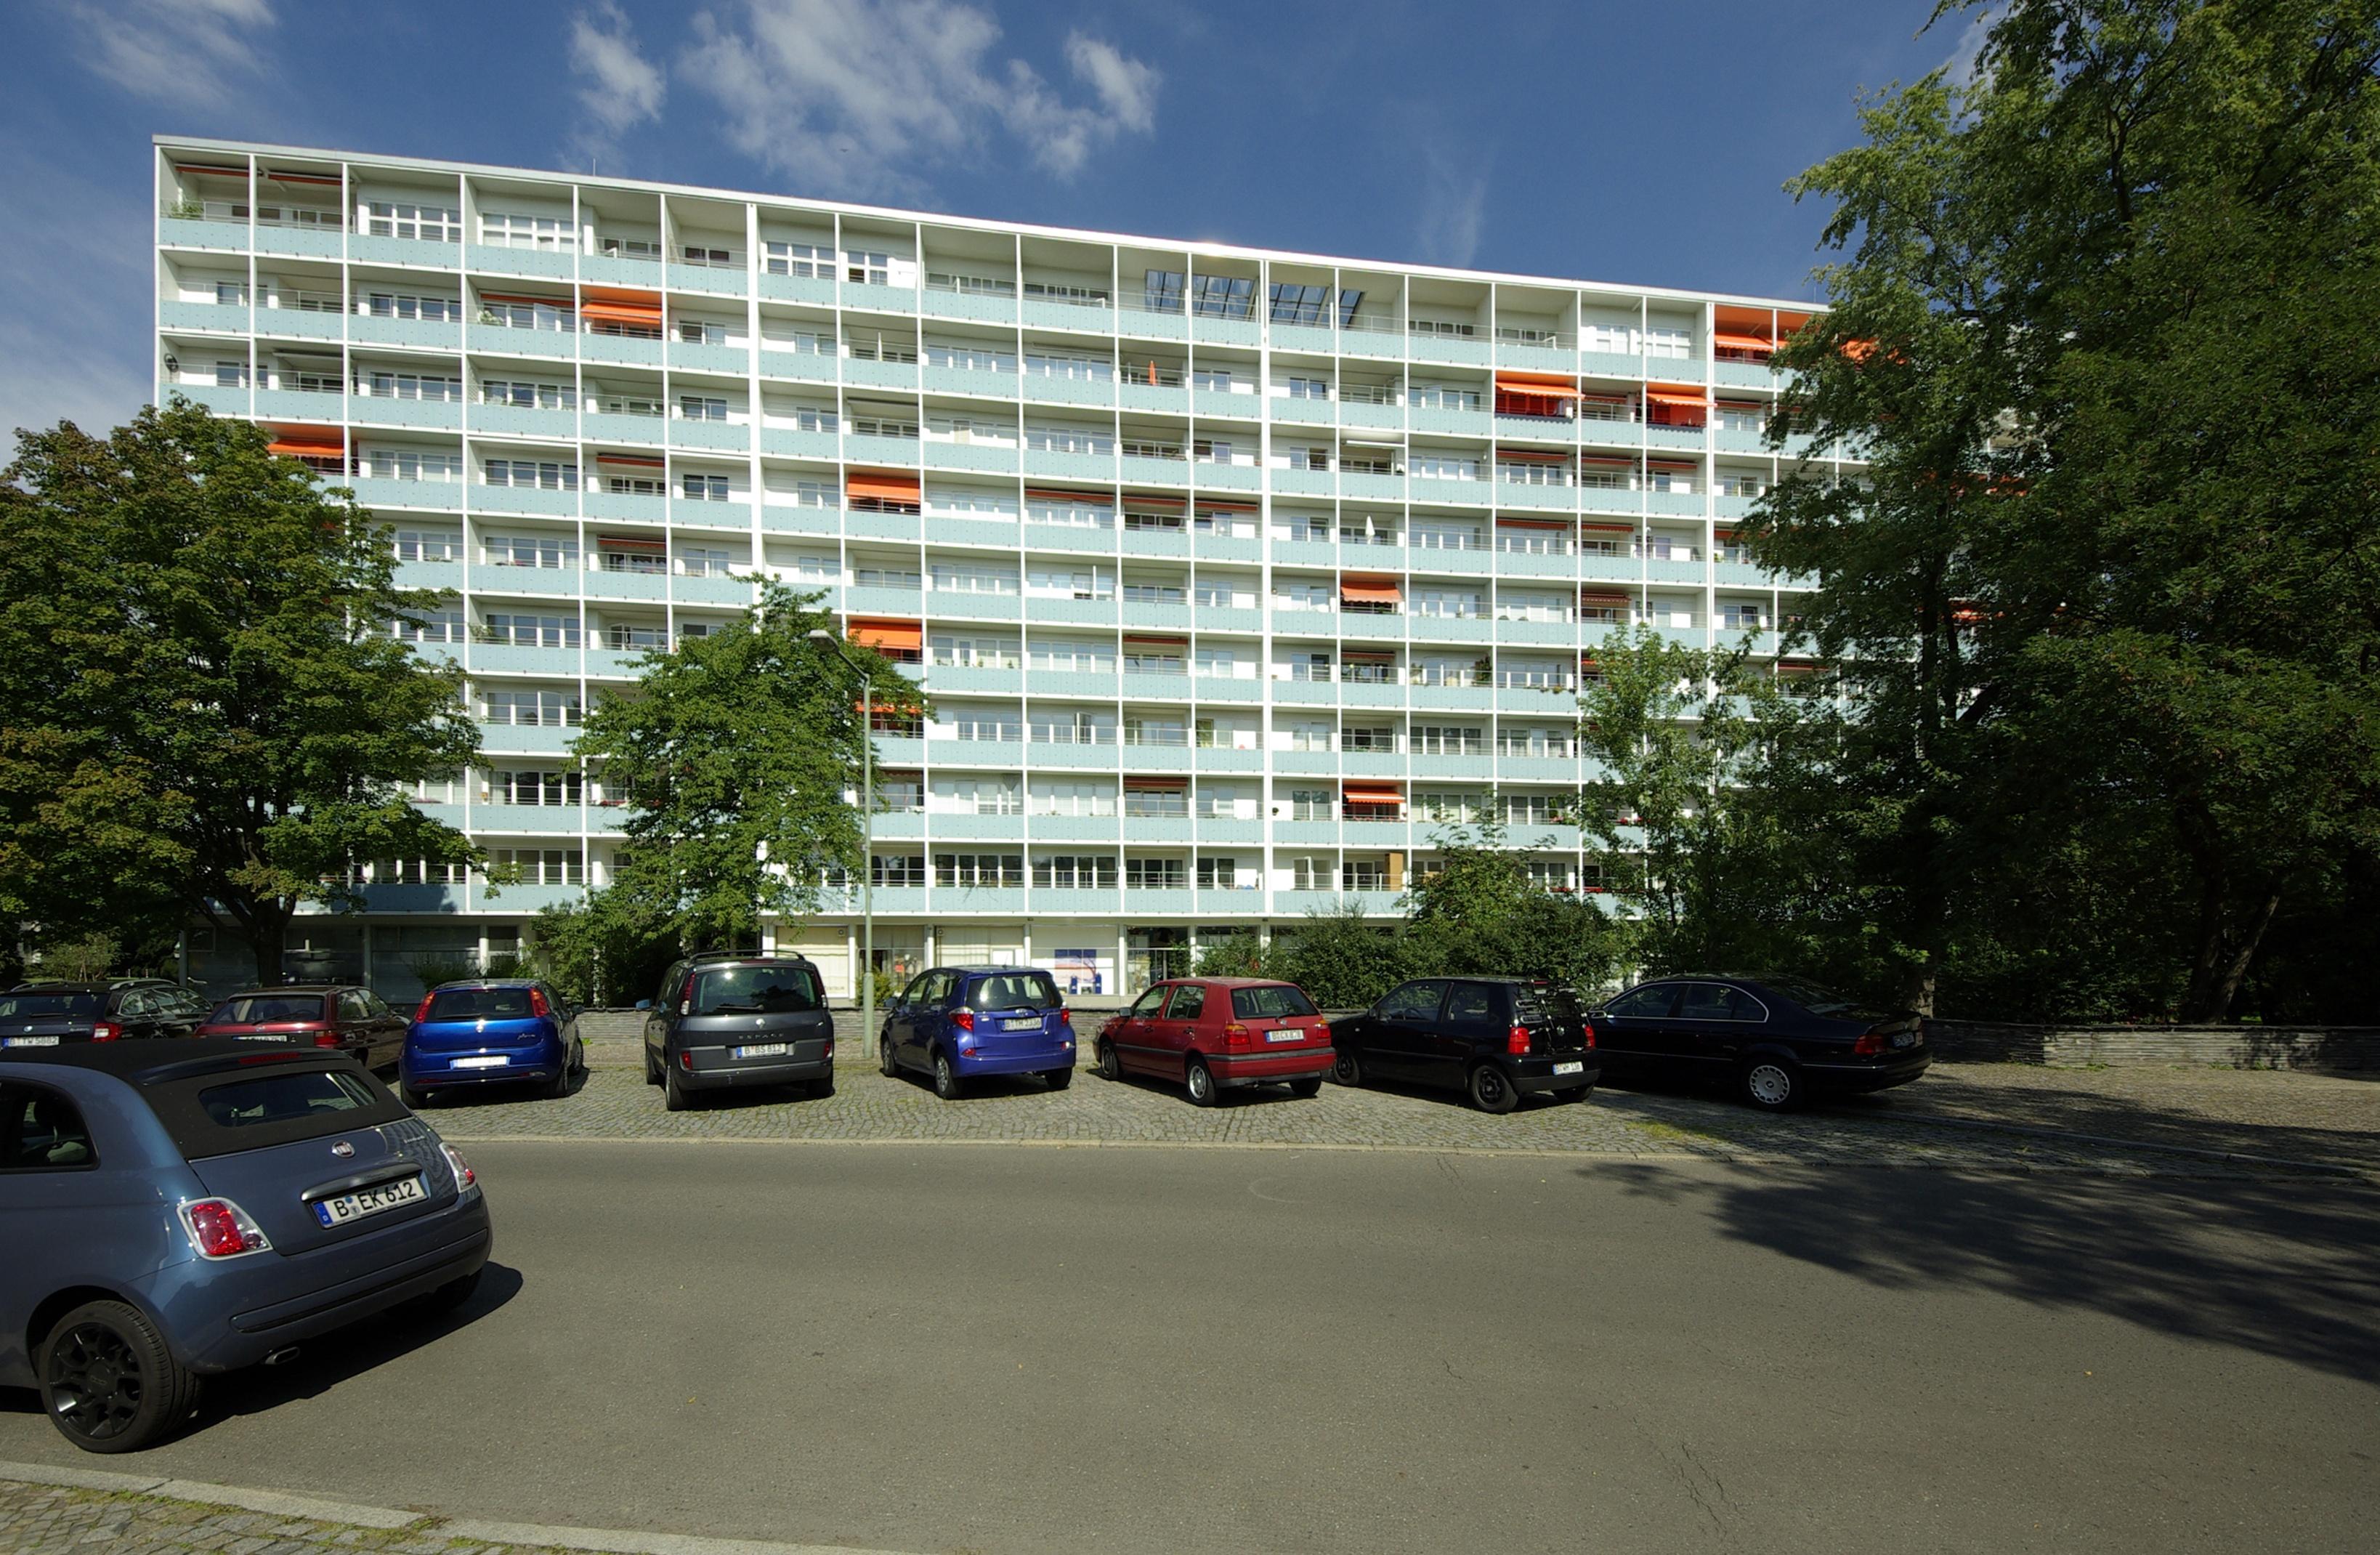 file berlin hansaviertel schwedenhaus 001 jpg wikimedia commons